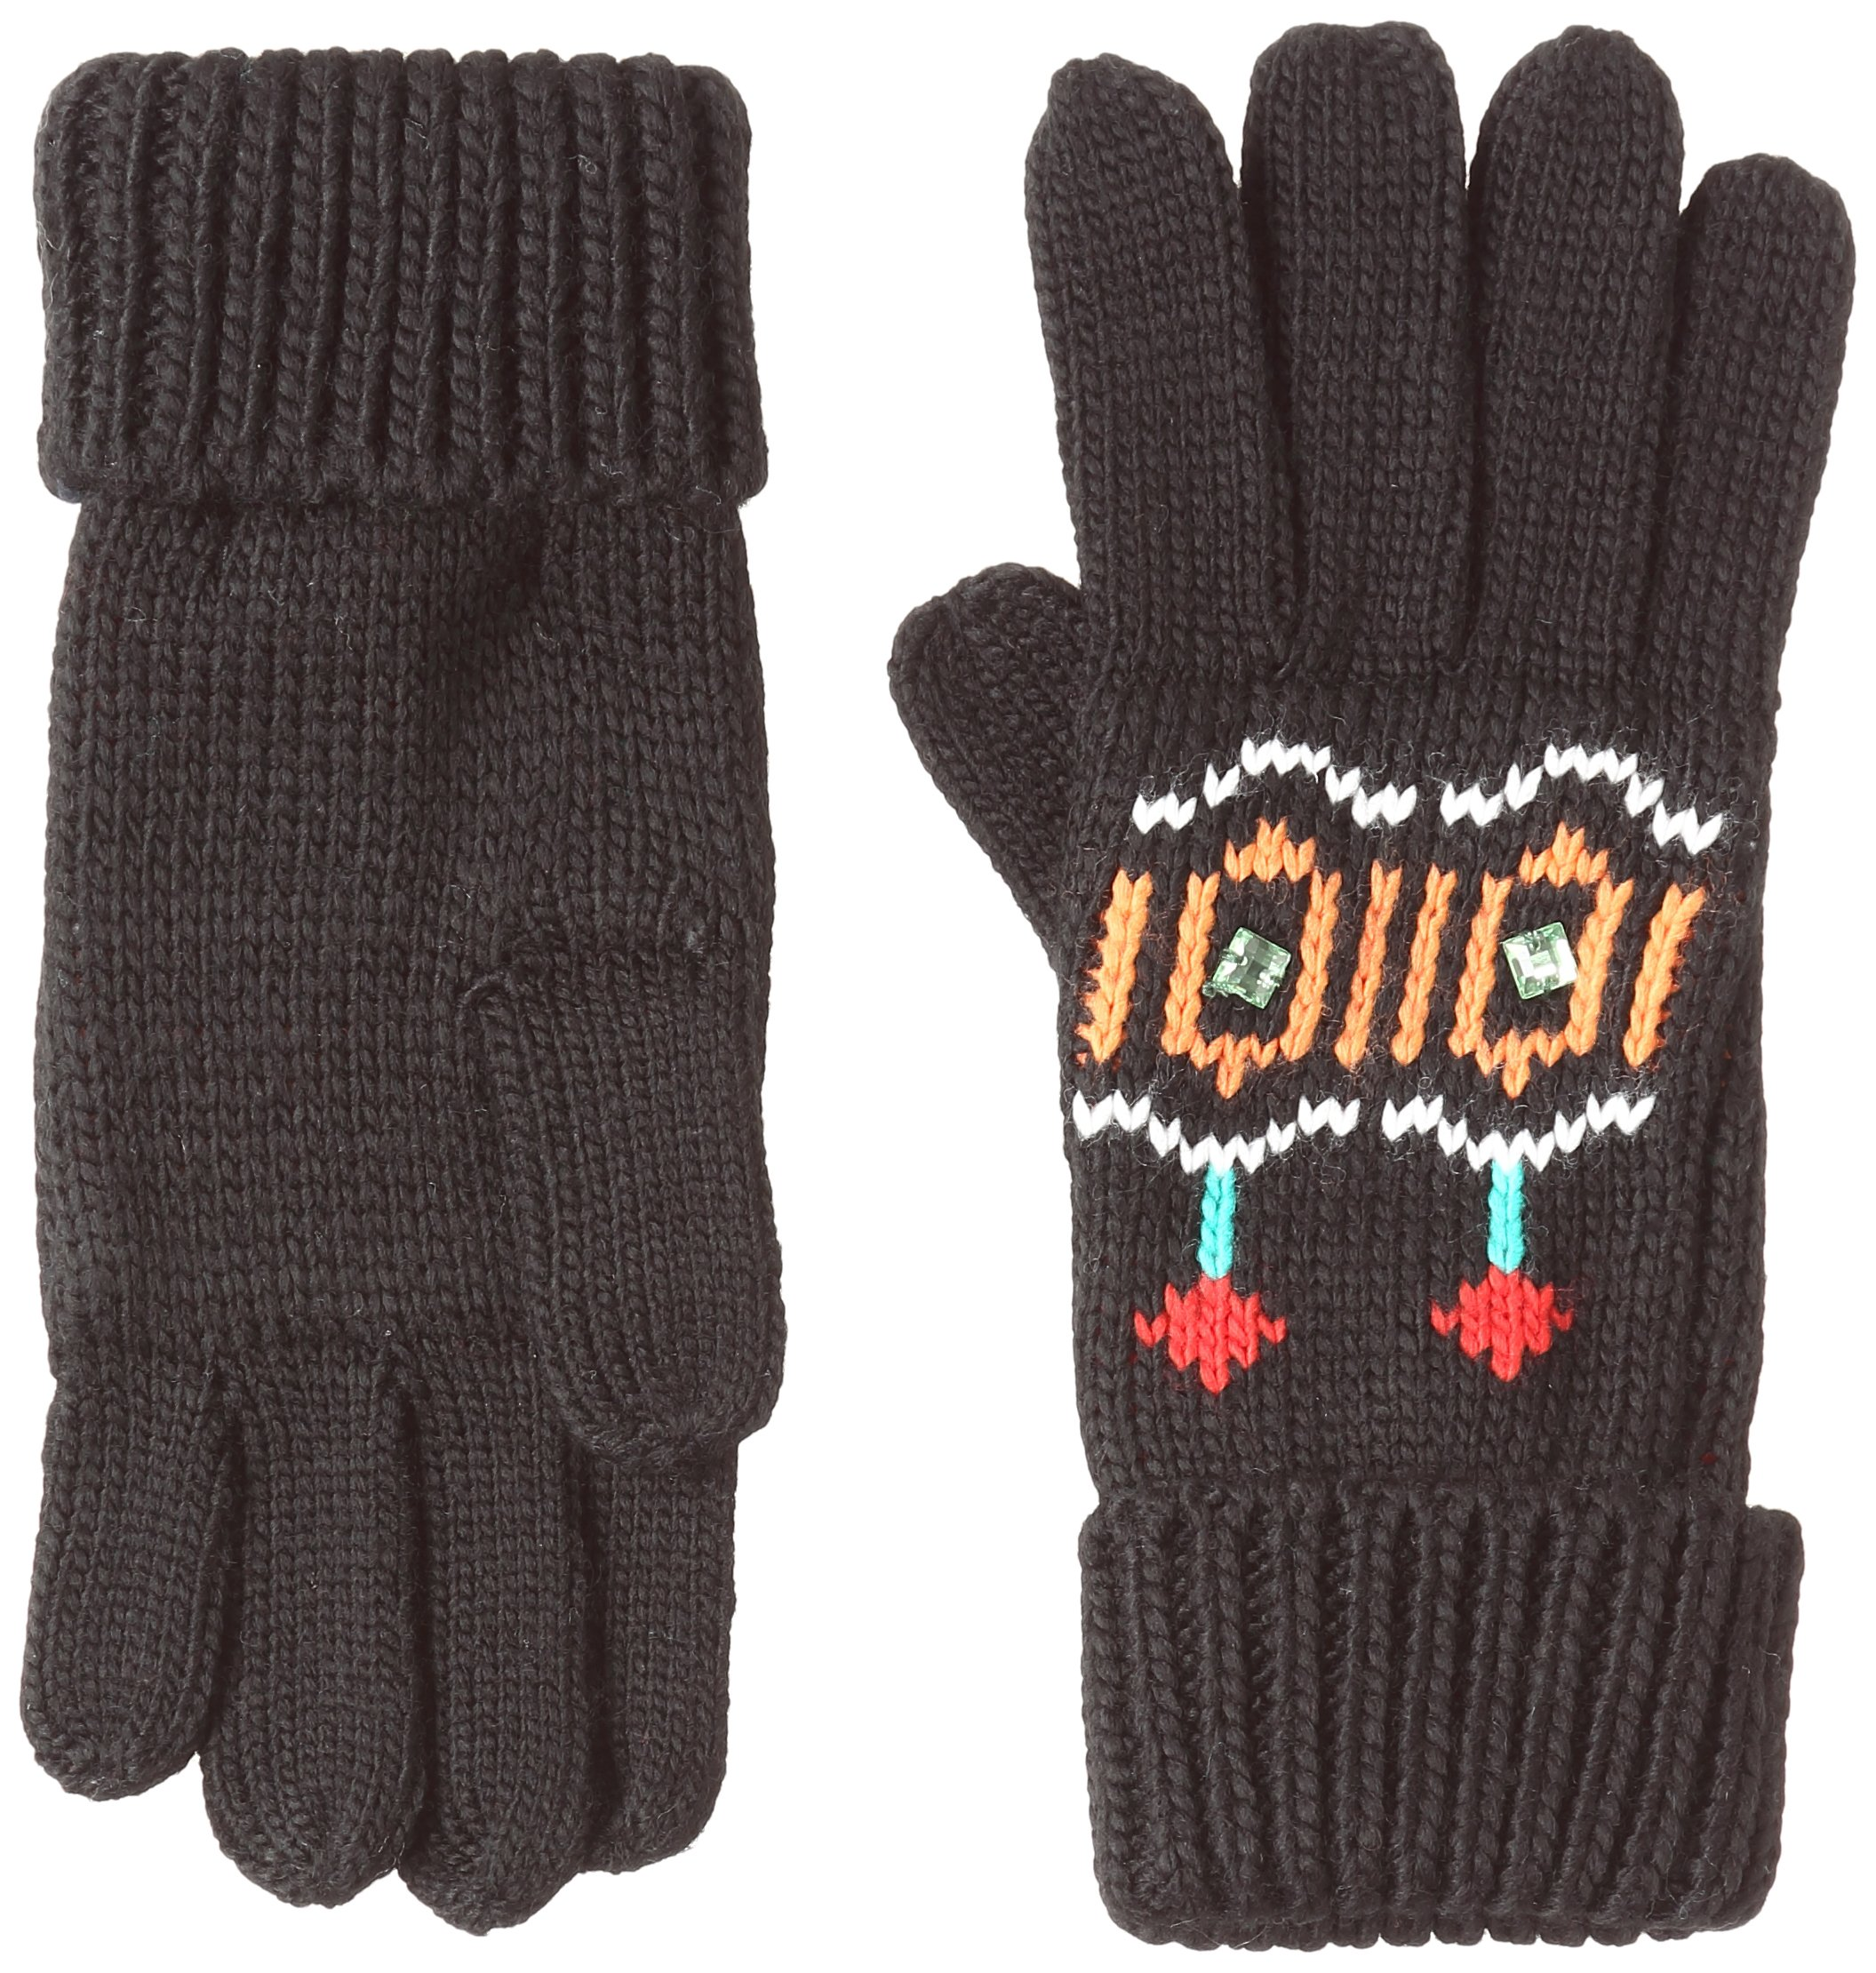 Desigual Gloves_Eternal Guantes, Negro (NEGRO 2000), Talla única (Talla del fabricante: One size) para Mujer